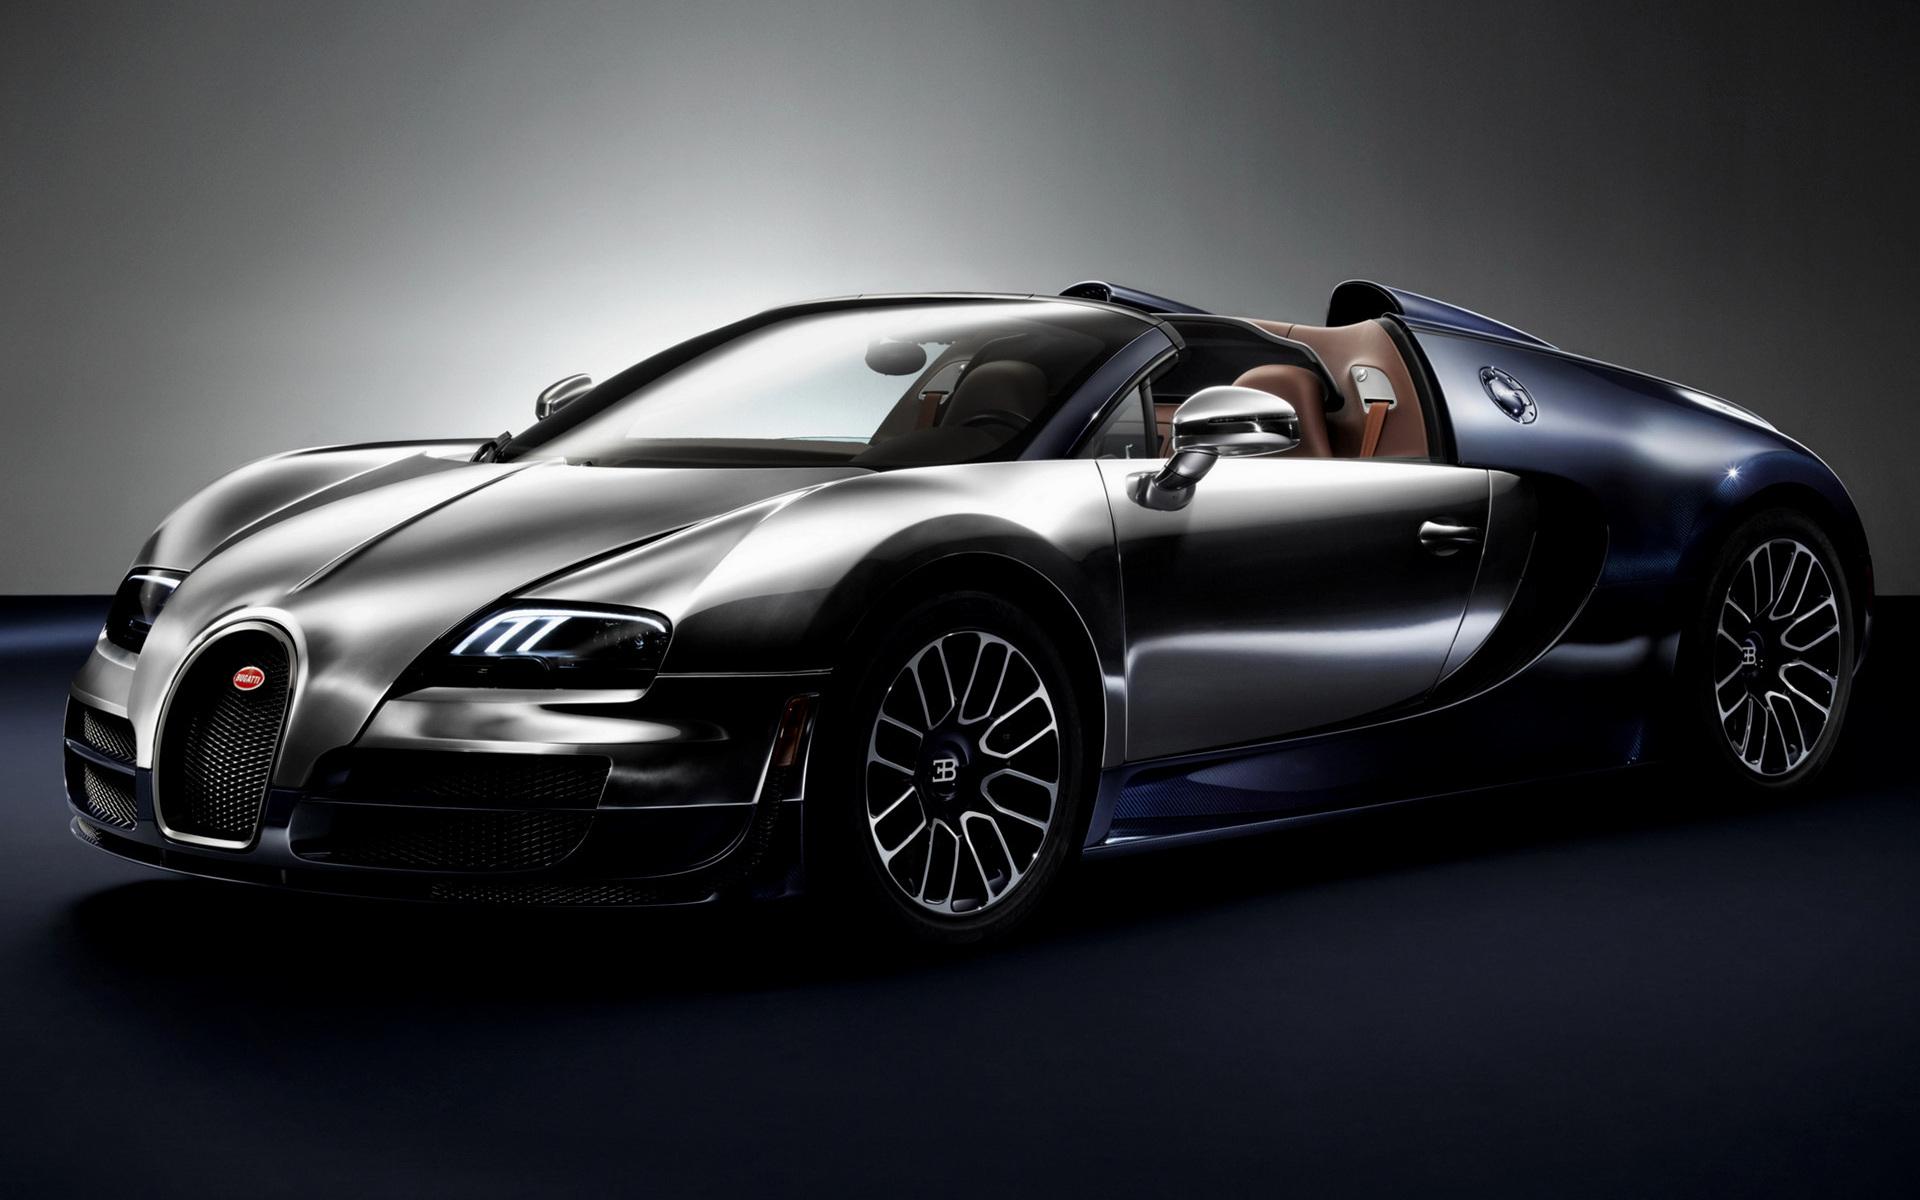 bugatti-veyron-grand-sport-vitesse-ettore-bugatti-car-wallpaper-10807 Inspiring Bugatti Veyron Grand Sport Vitesse Wrc Cars Trend